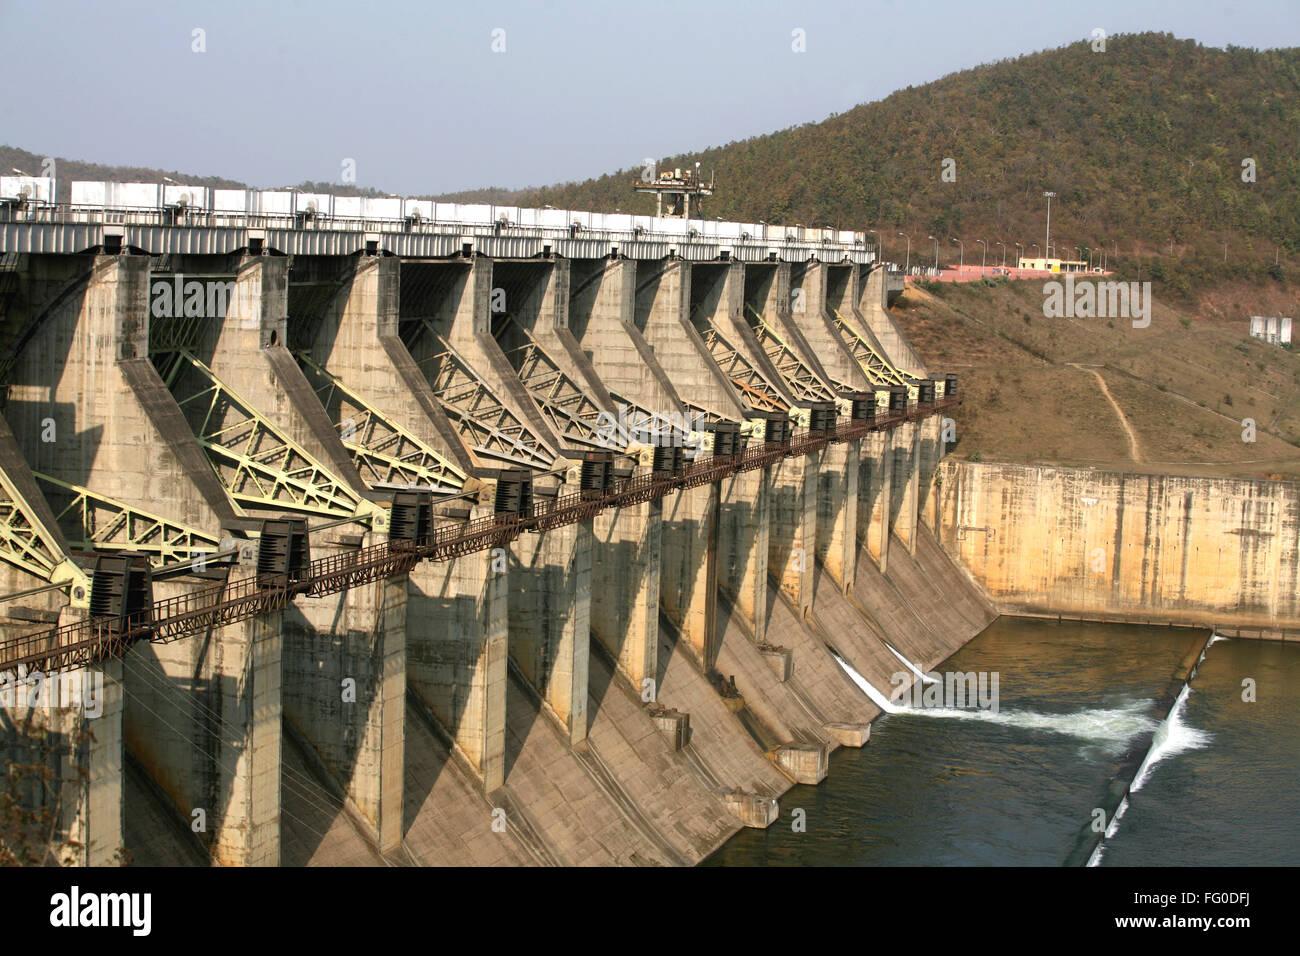 Chandil Dam Hydro electric power project 2x4 MW capacity at Chandil , Saraikela Kharsanwa district of Jharkhand - Stock Image